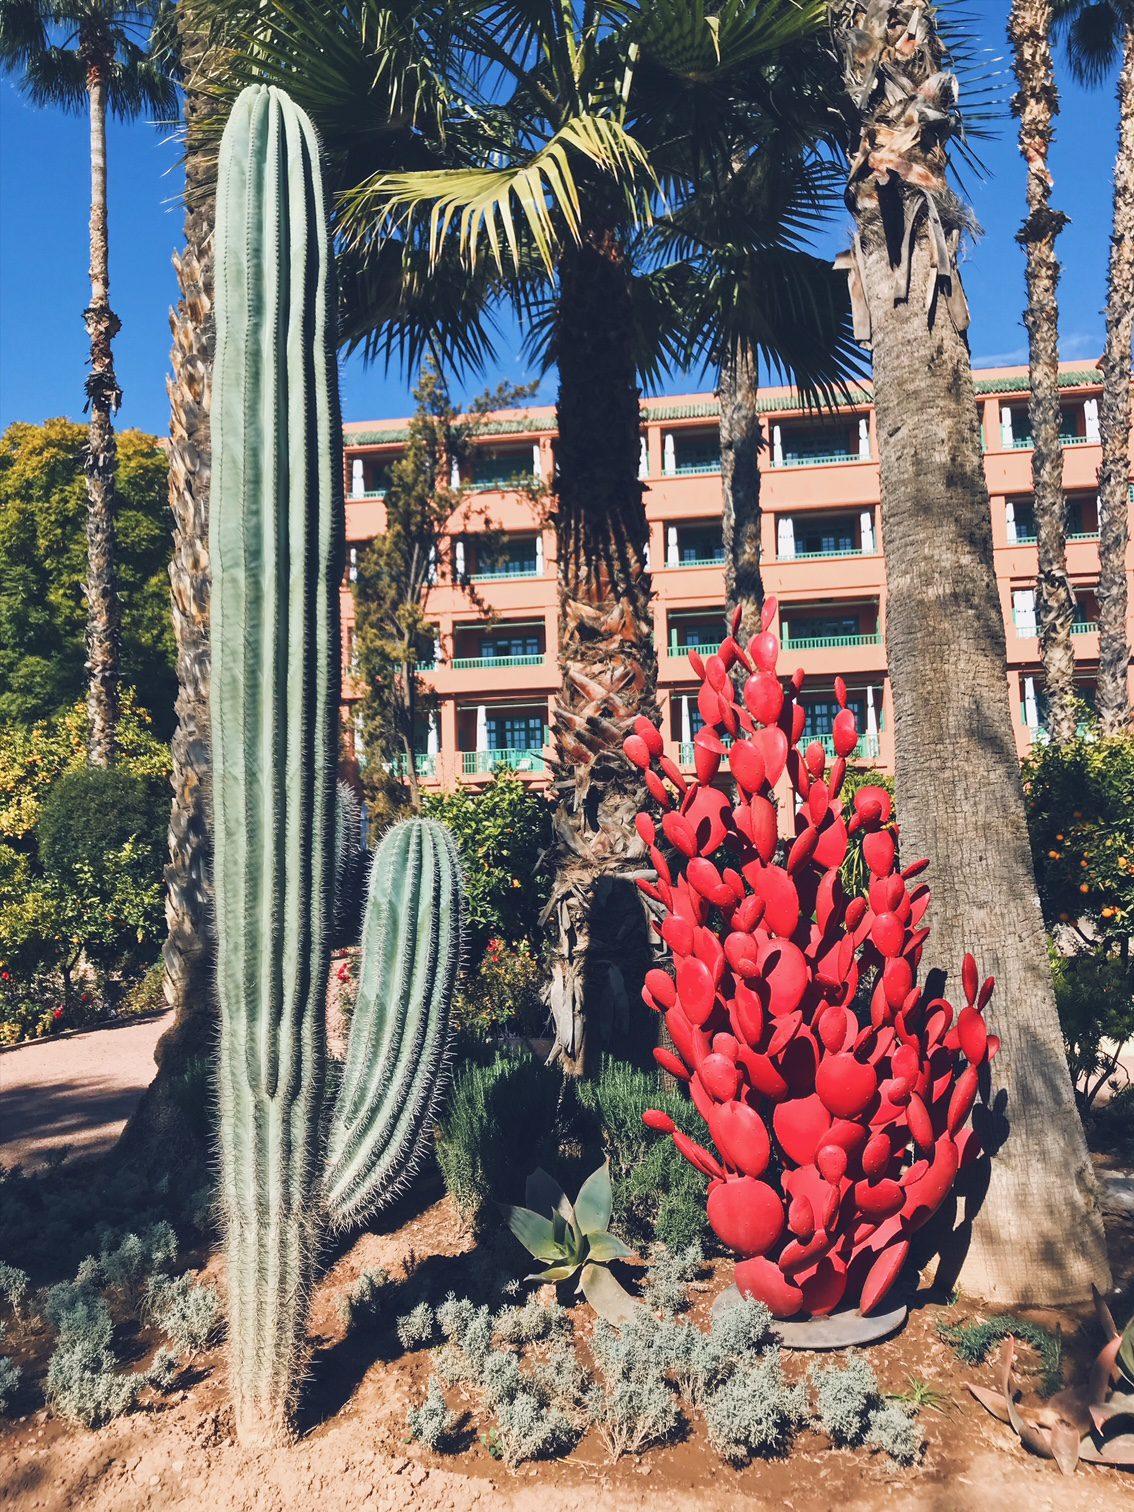 Voyage au Maroc Marrakech la Mamounia jardin avec cactus